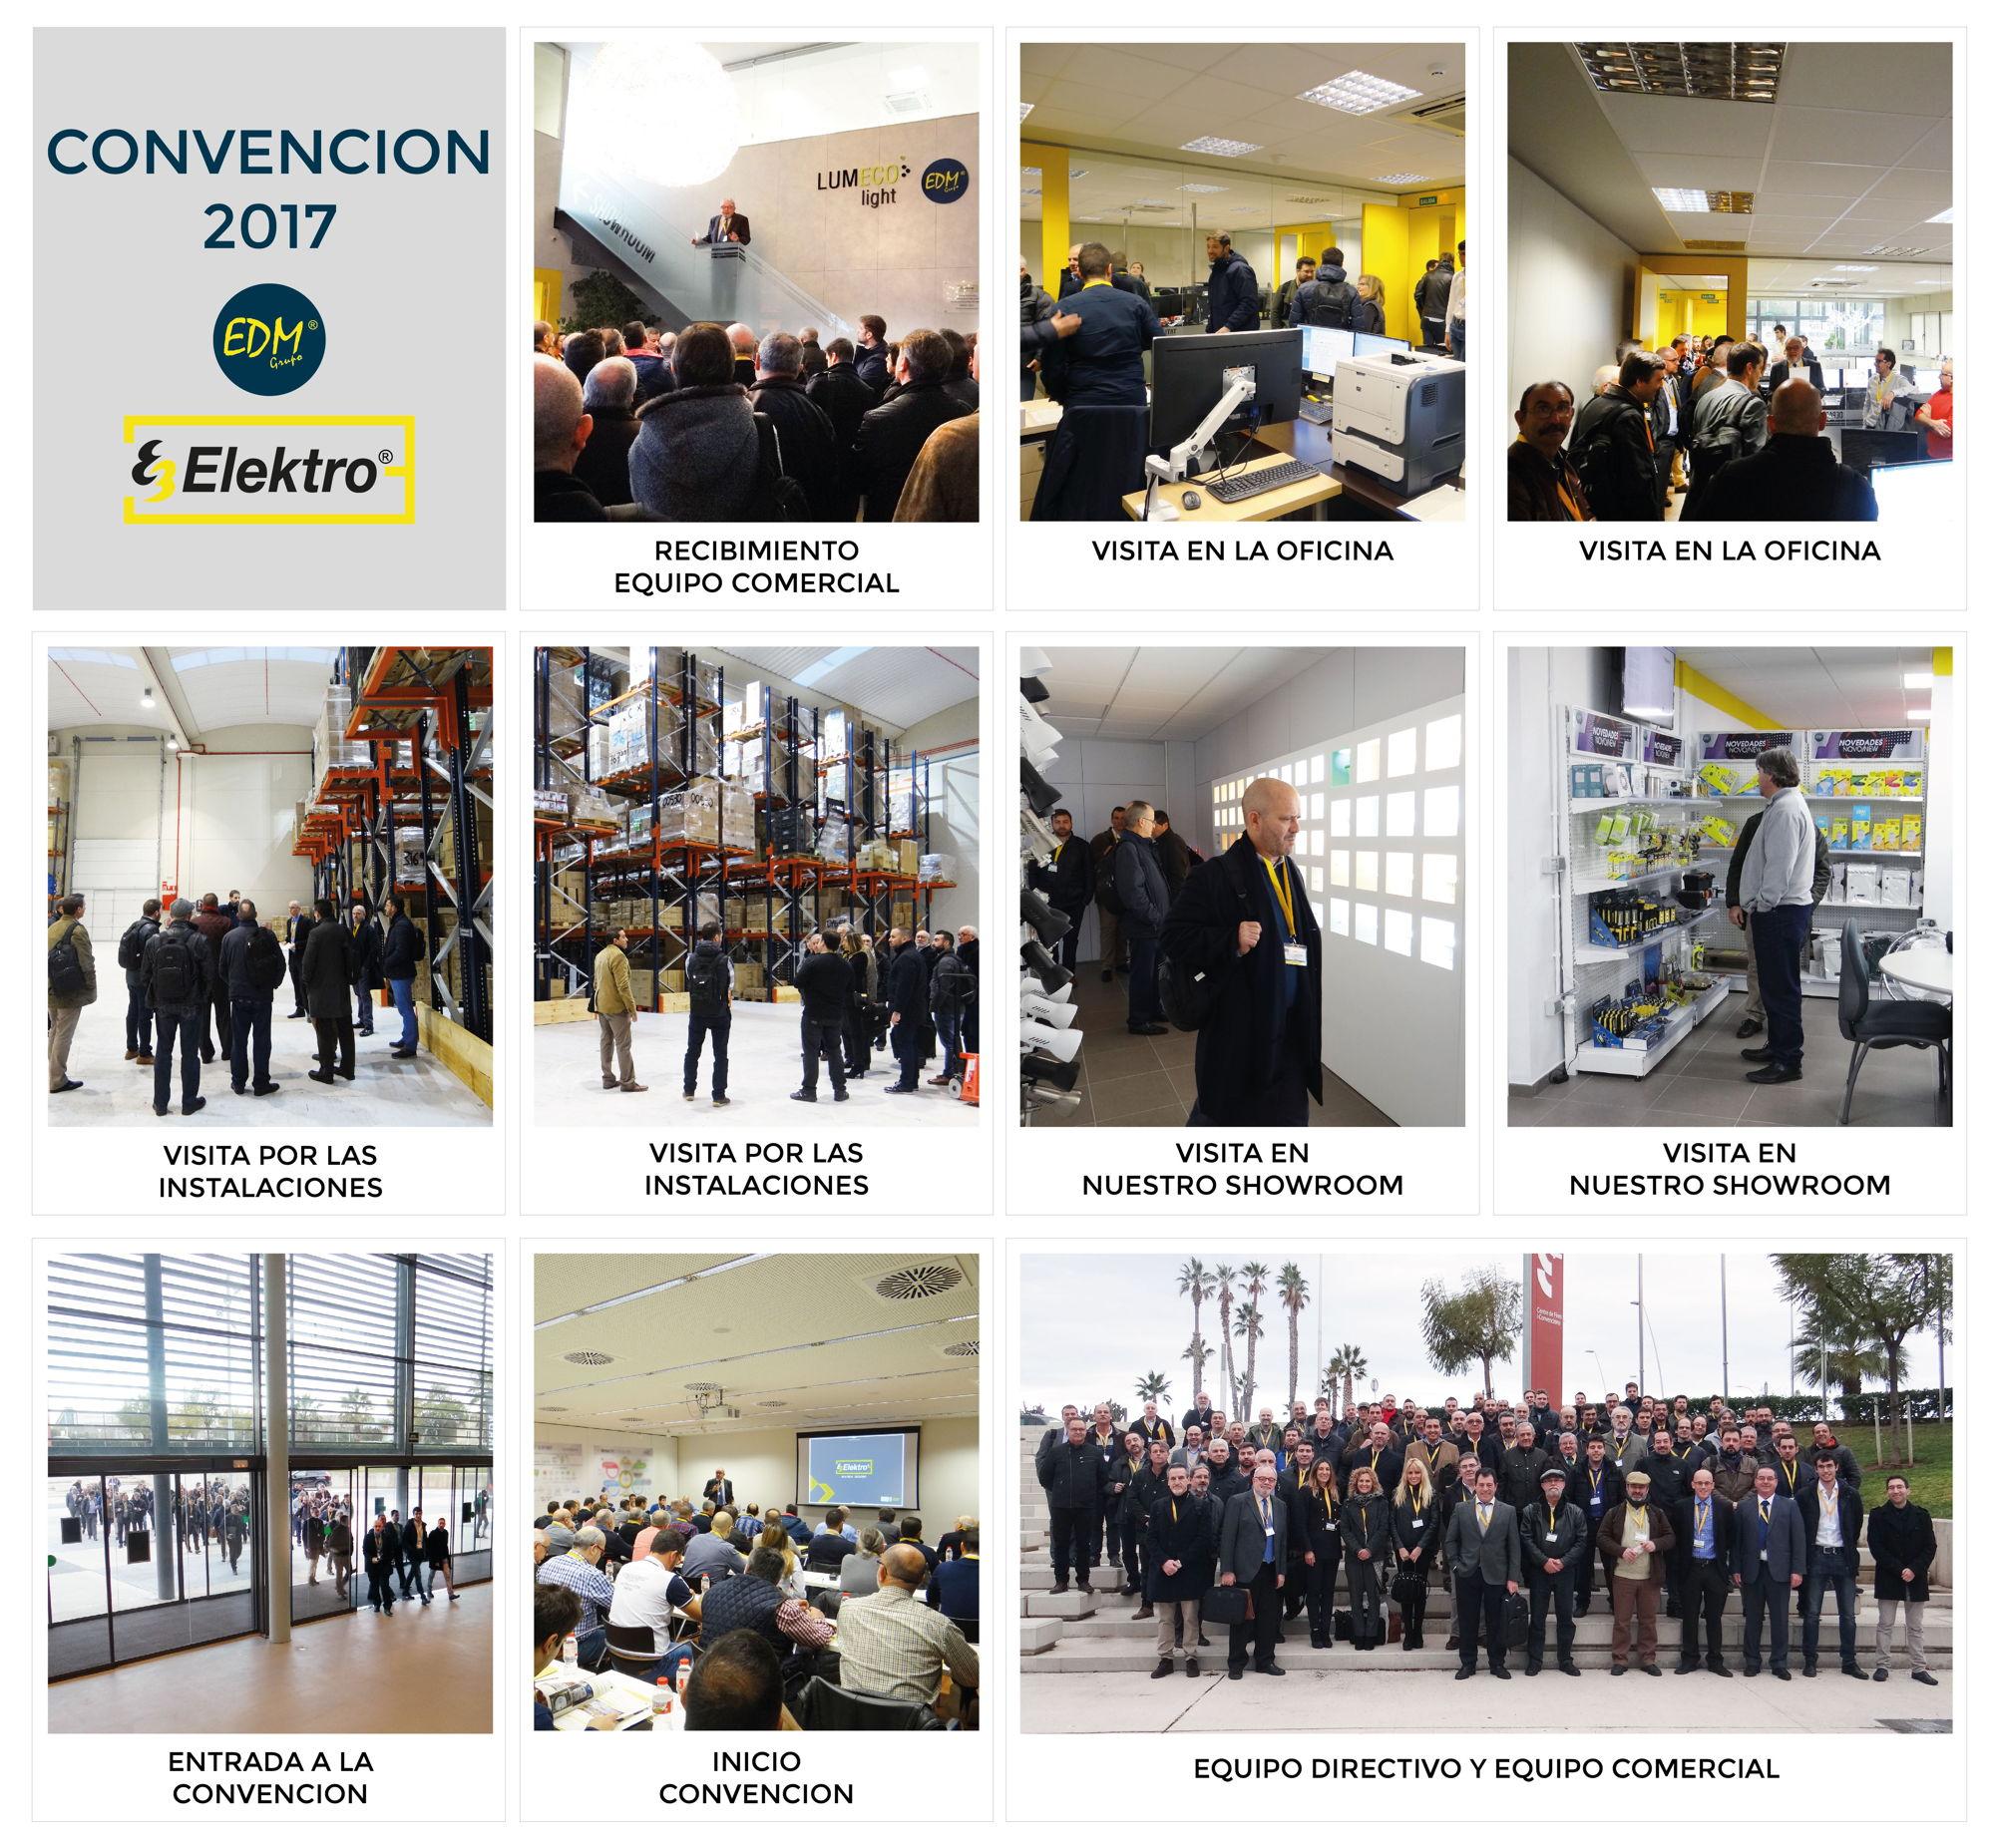 Convención Elektro3 - Grupo EDM 2017